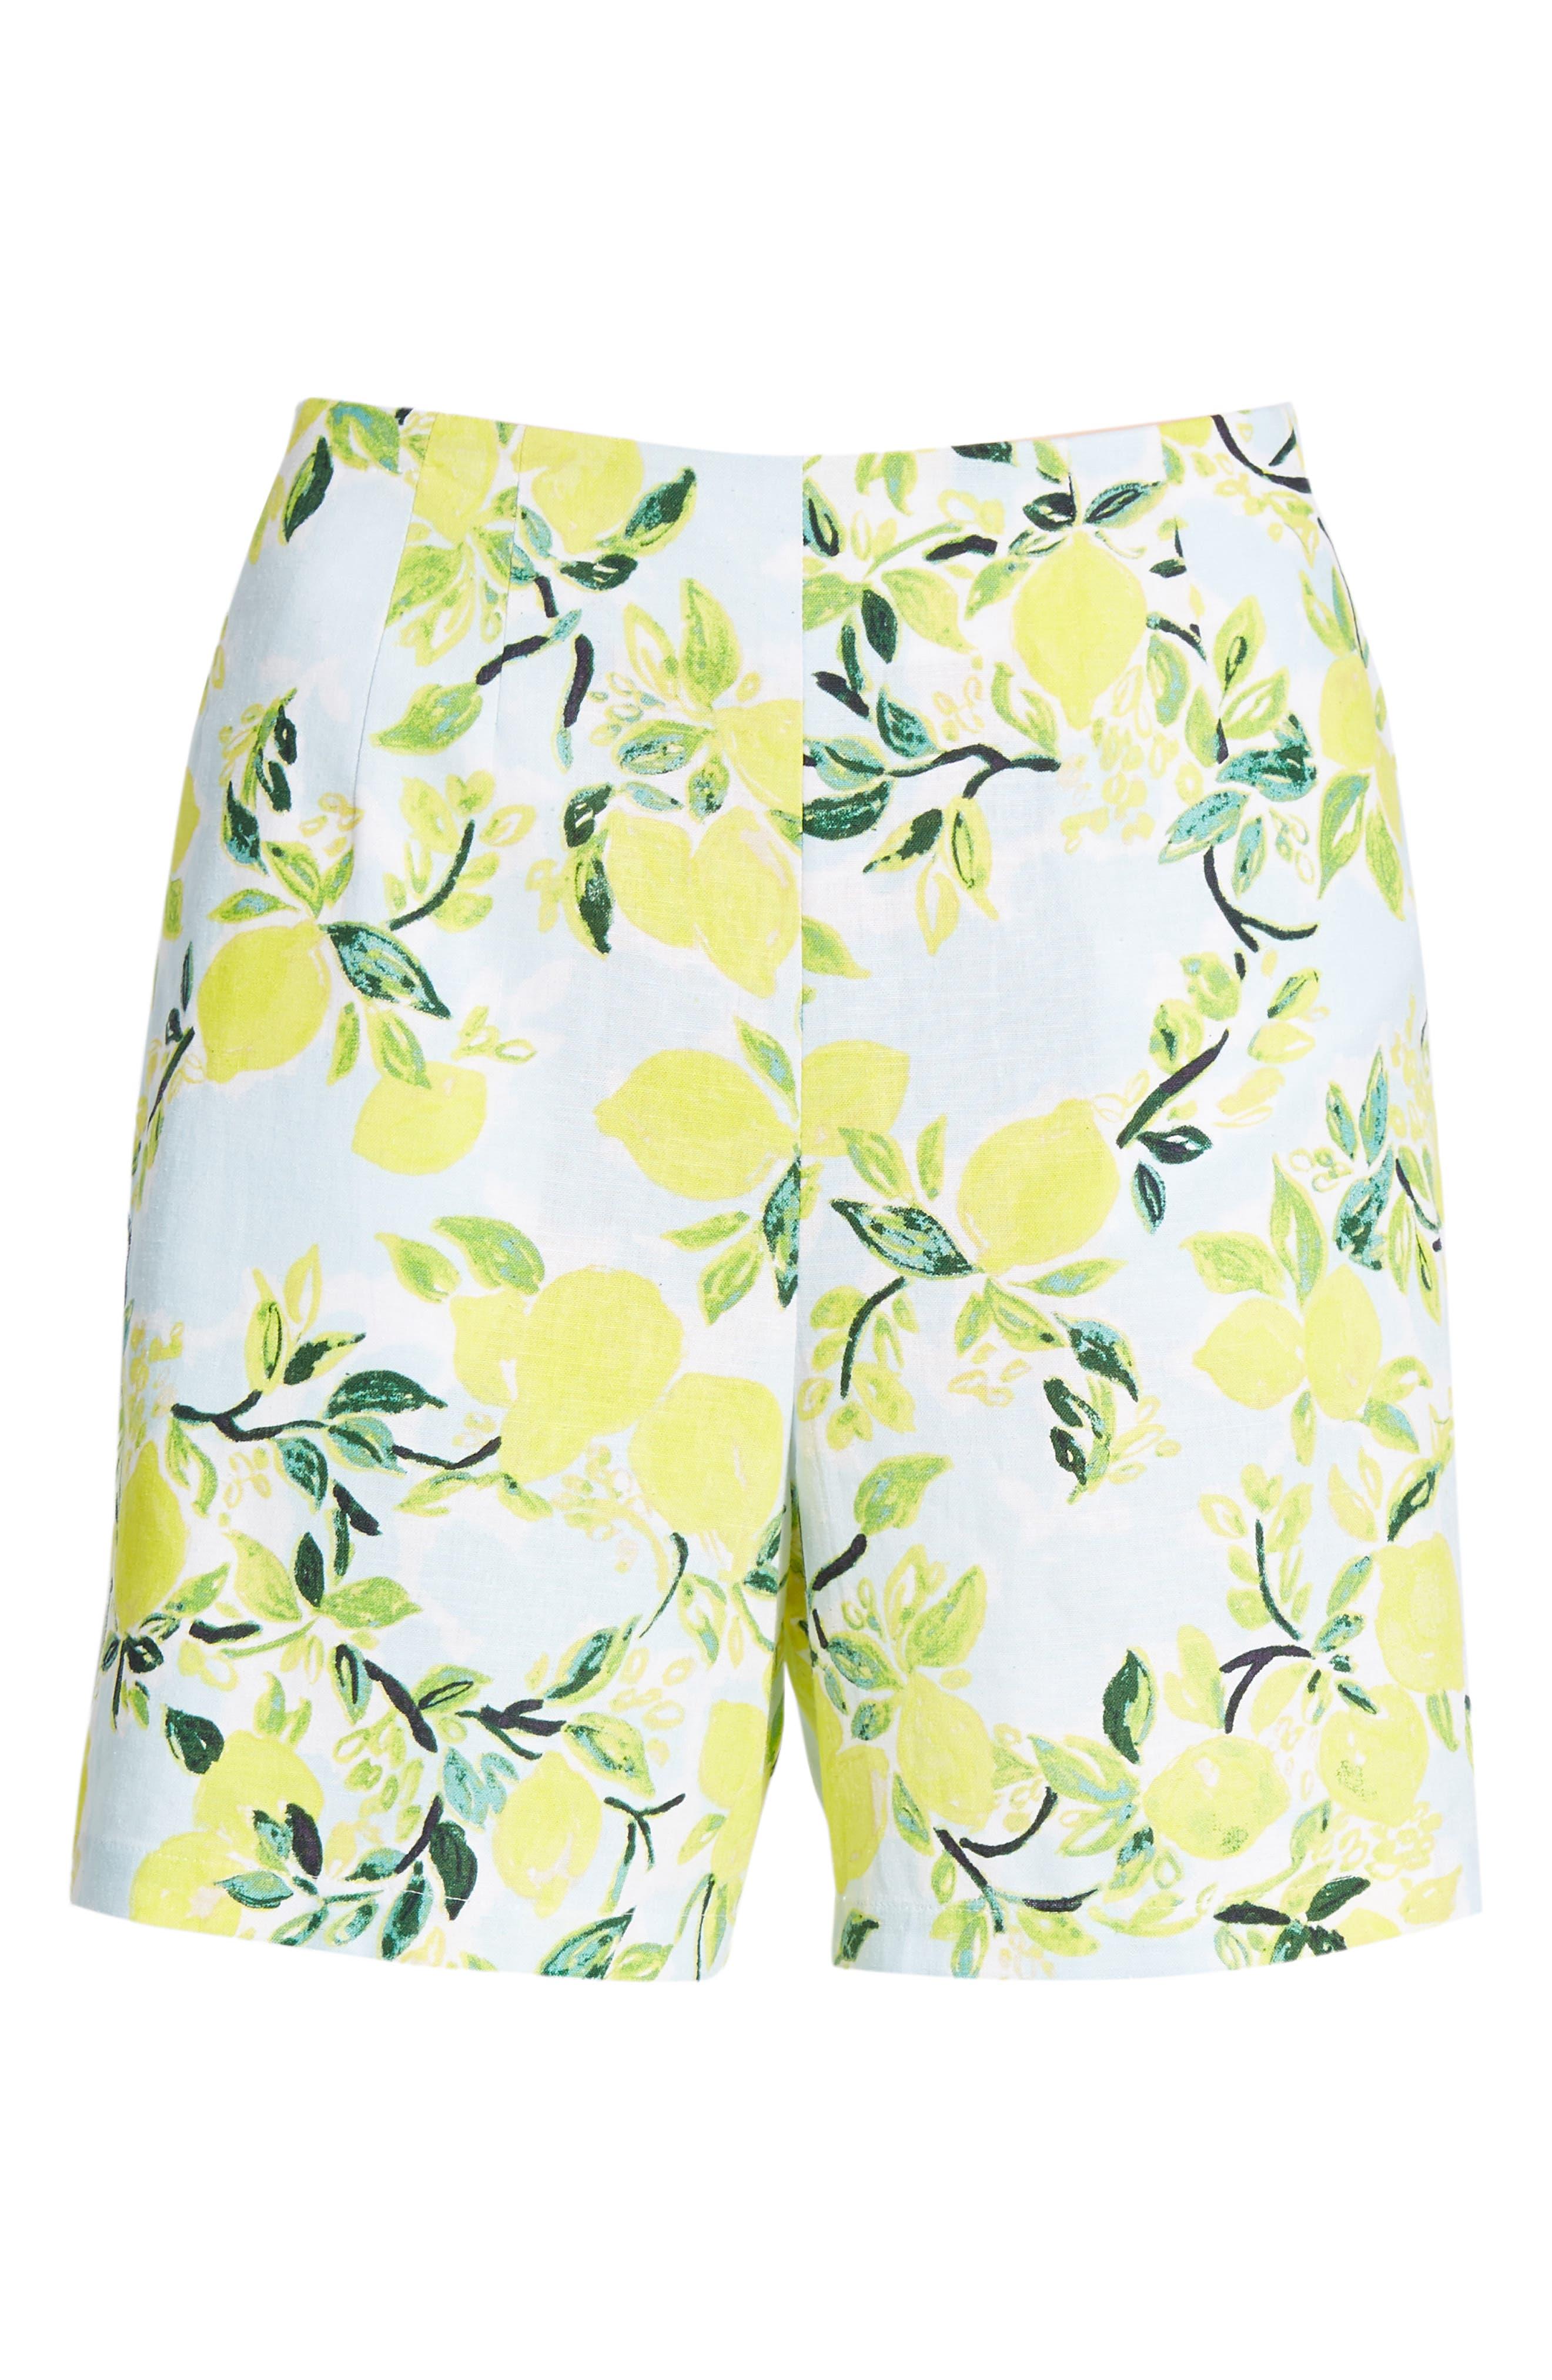 Print Linen Blend Shorts,                             Alternate thumbnail 6, color,                             Blue- Yellow Citrus Print